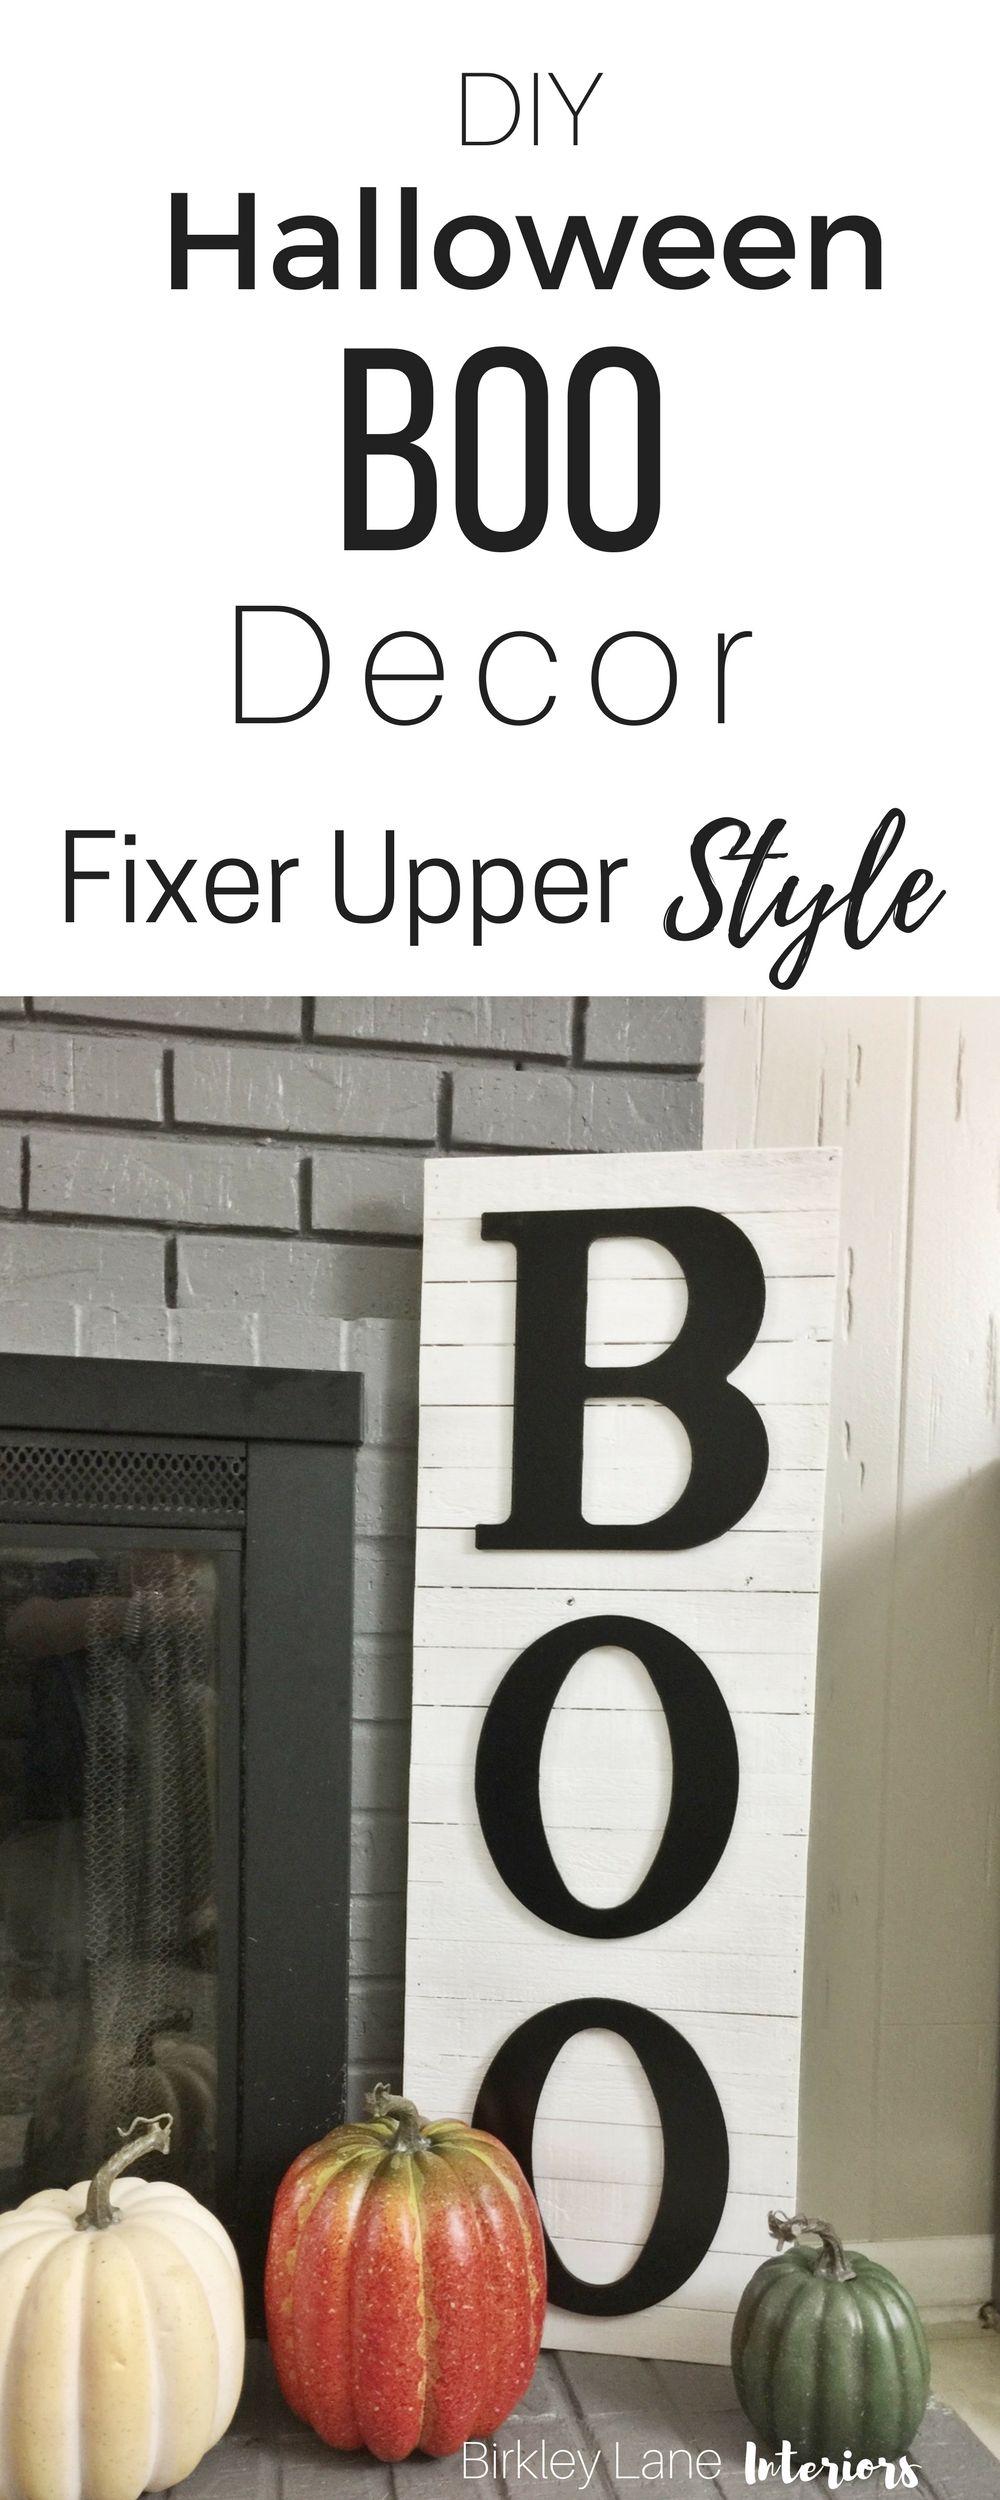 DIY Halloween BOO Decor: Fixer Upper Style   Home-made Halloween ...